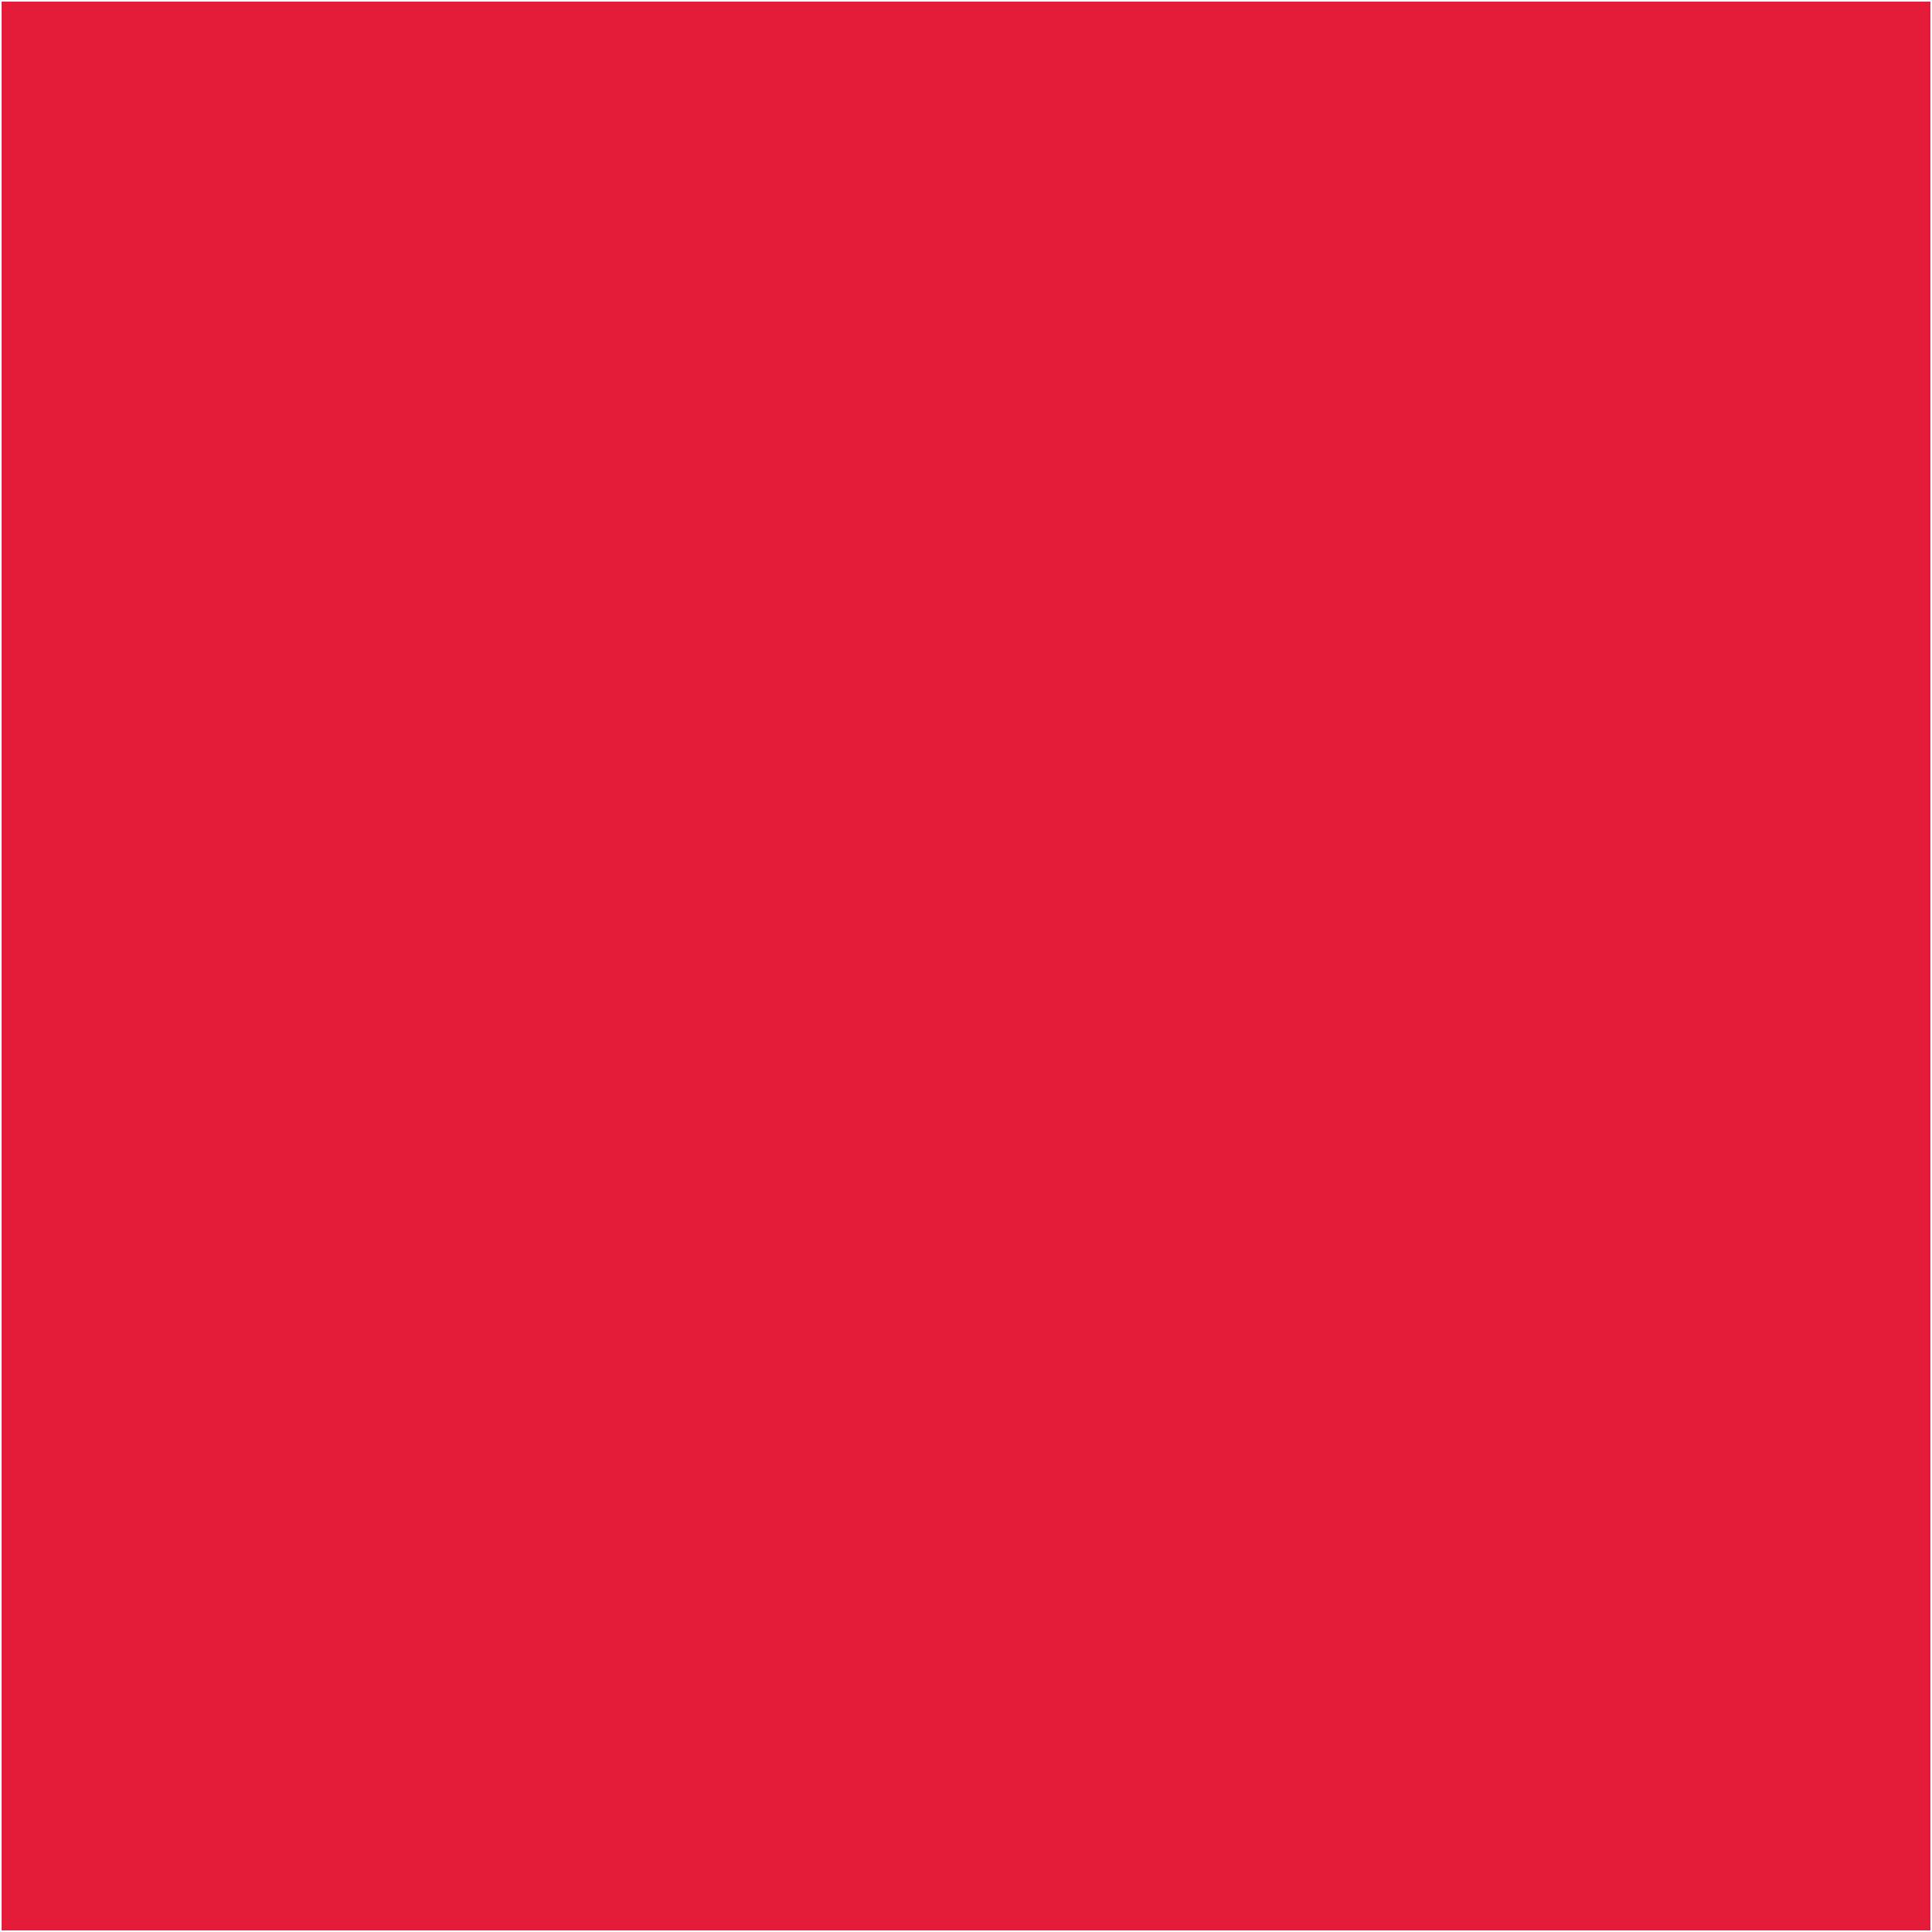 686 Enterprises